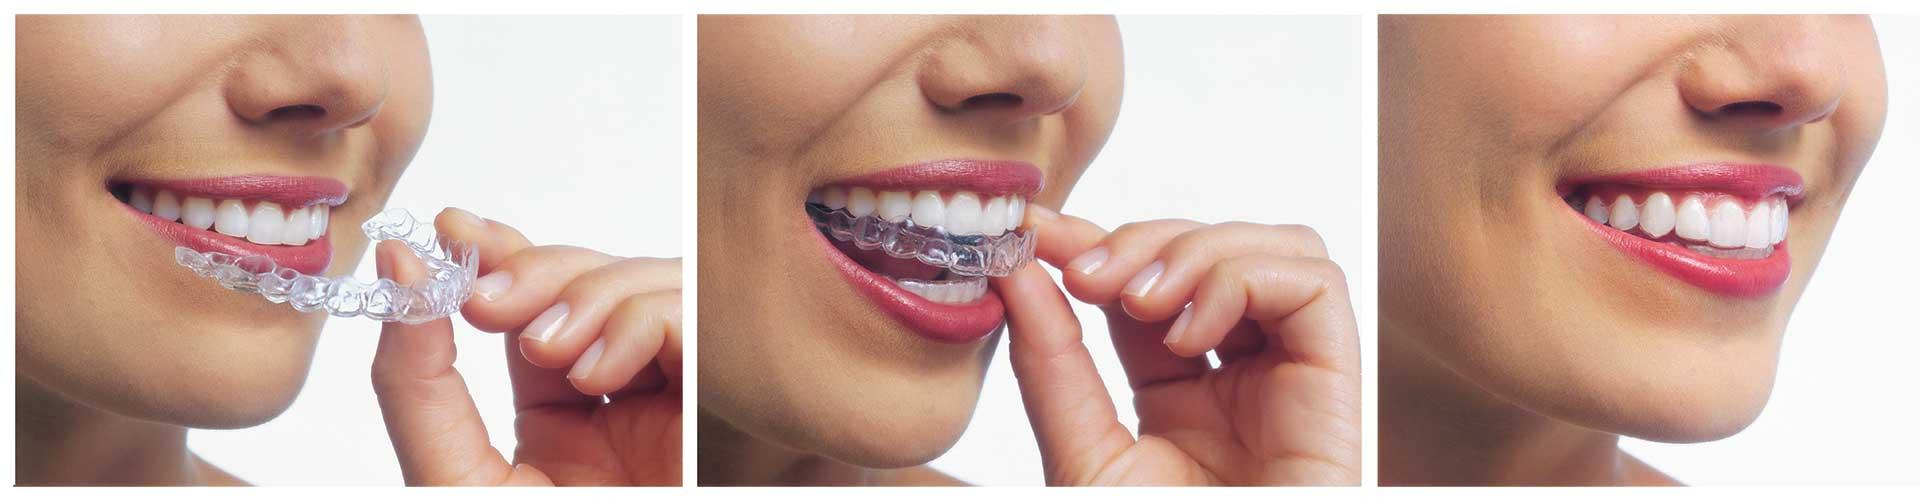 Cost of Invisalign at Benko Orthodontics at Sarver Kittanning Butler PA